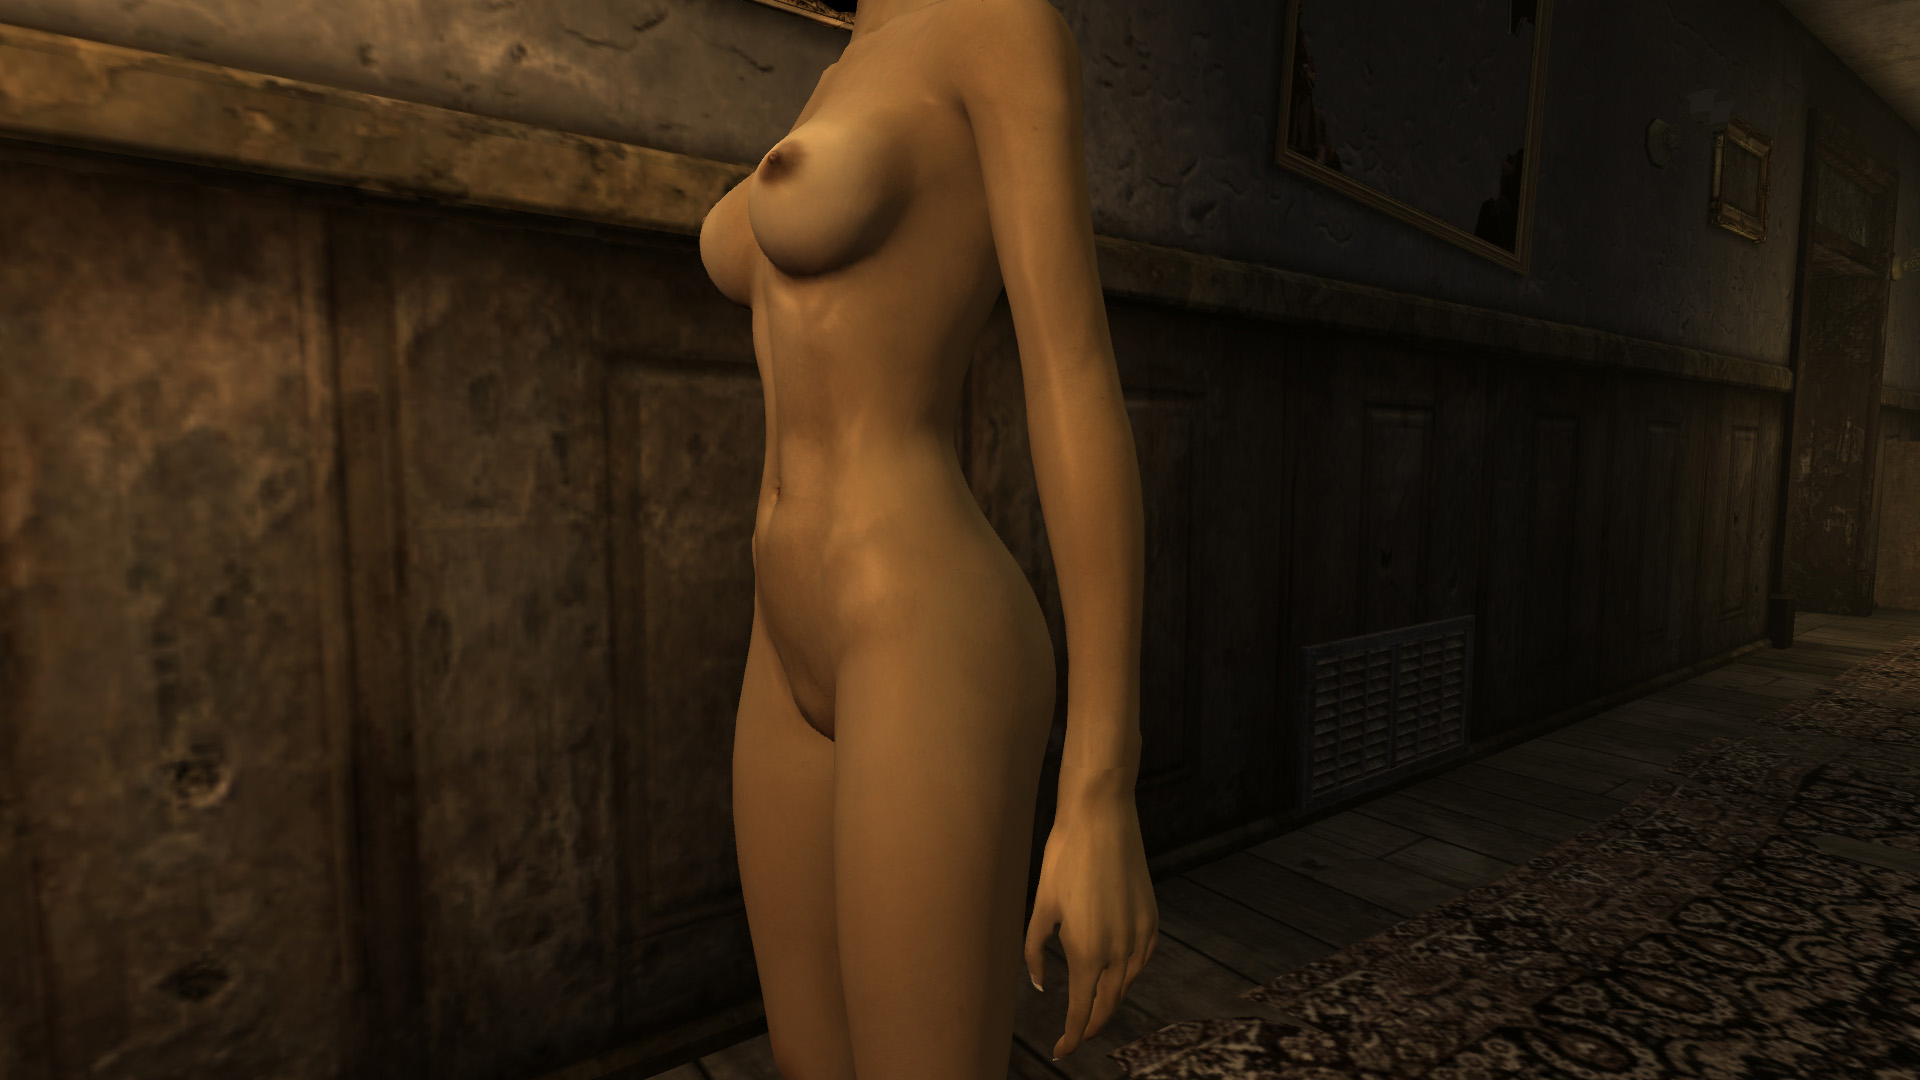 Naked girls playing fallout #15